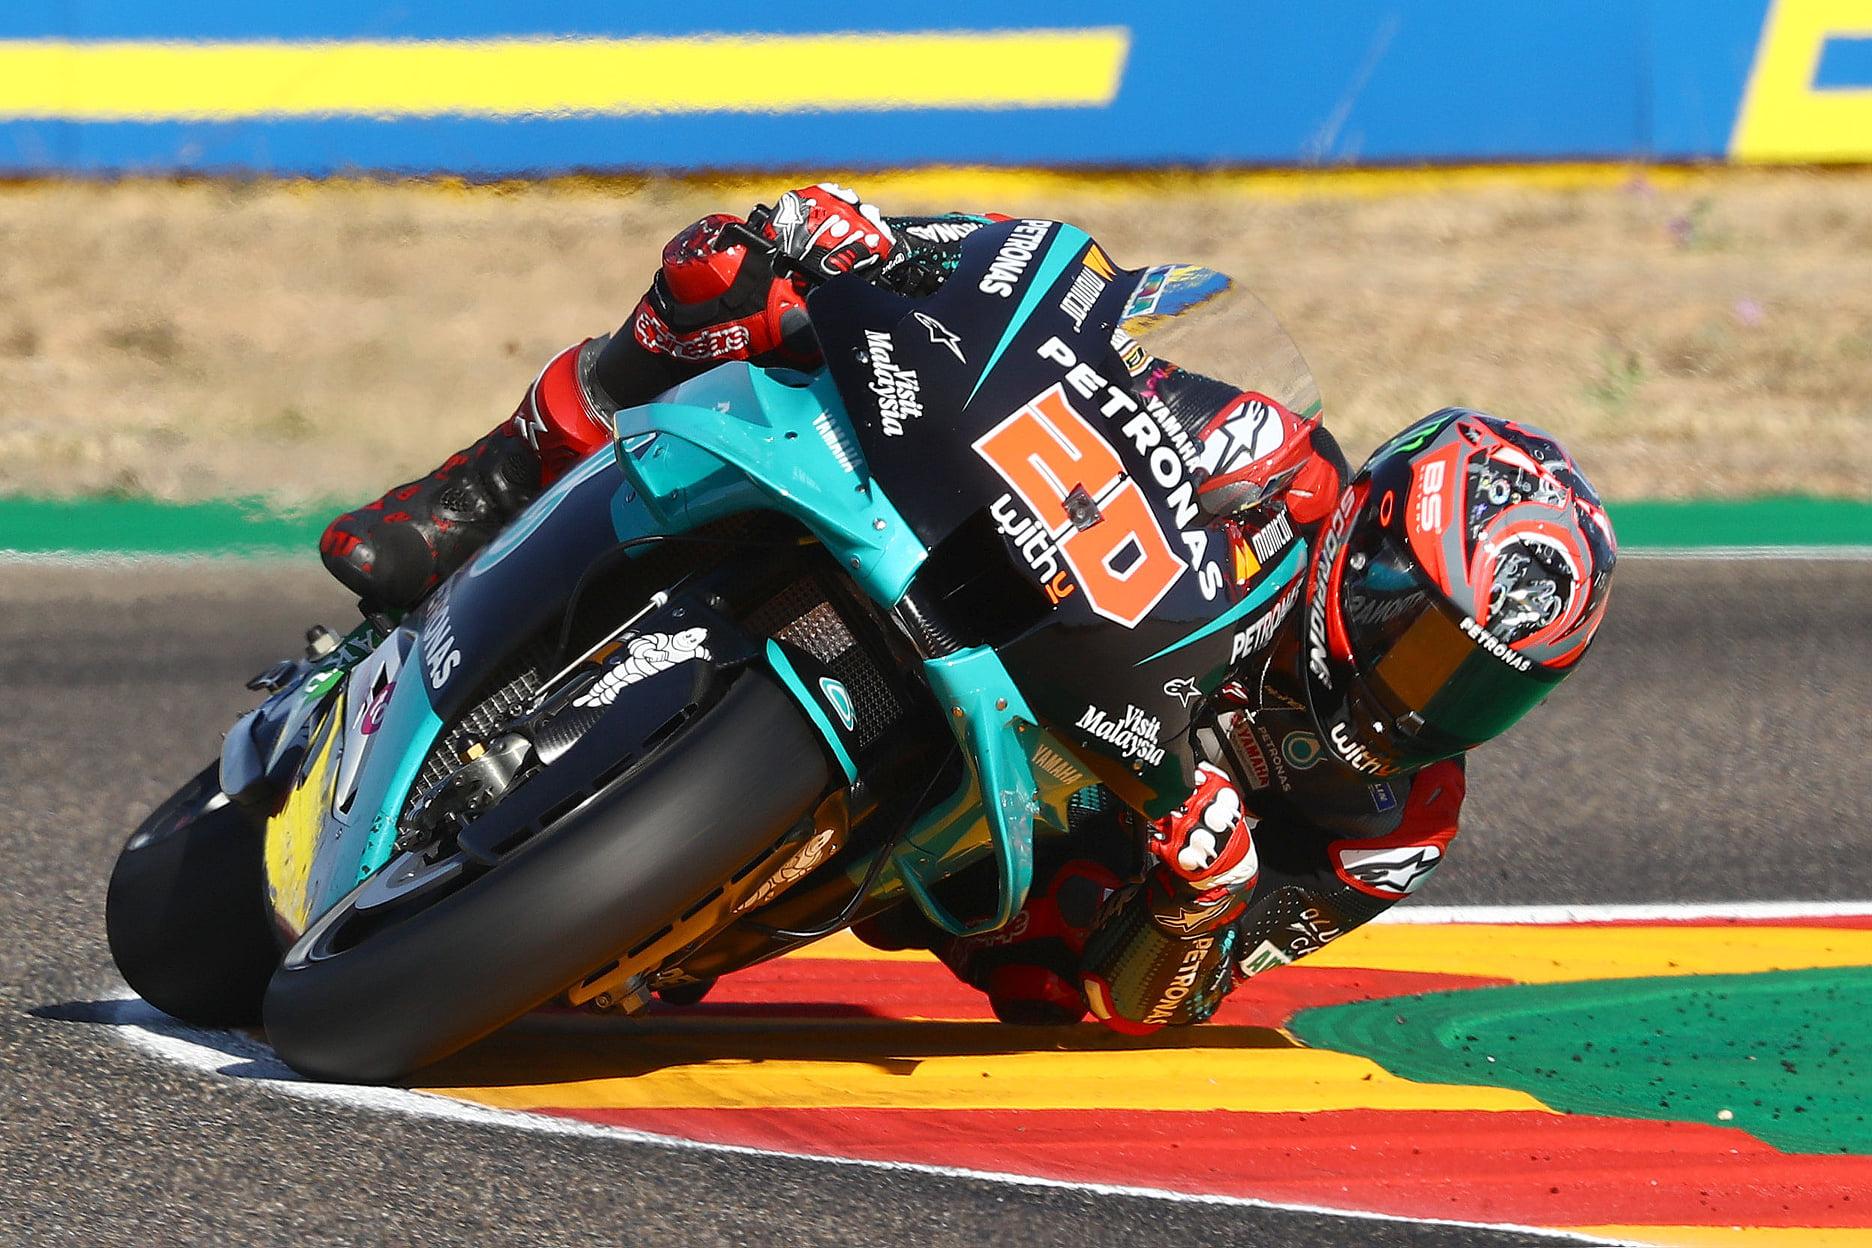 MotoGP: Valentino Rossi tests positive for Covid